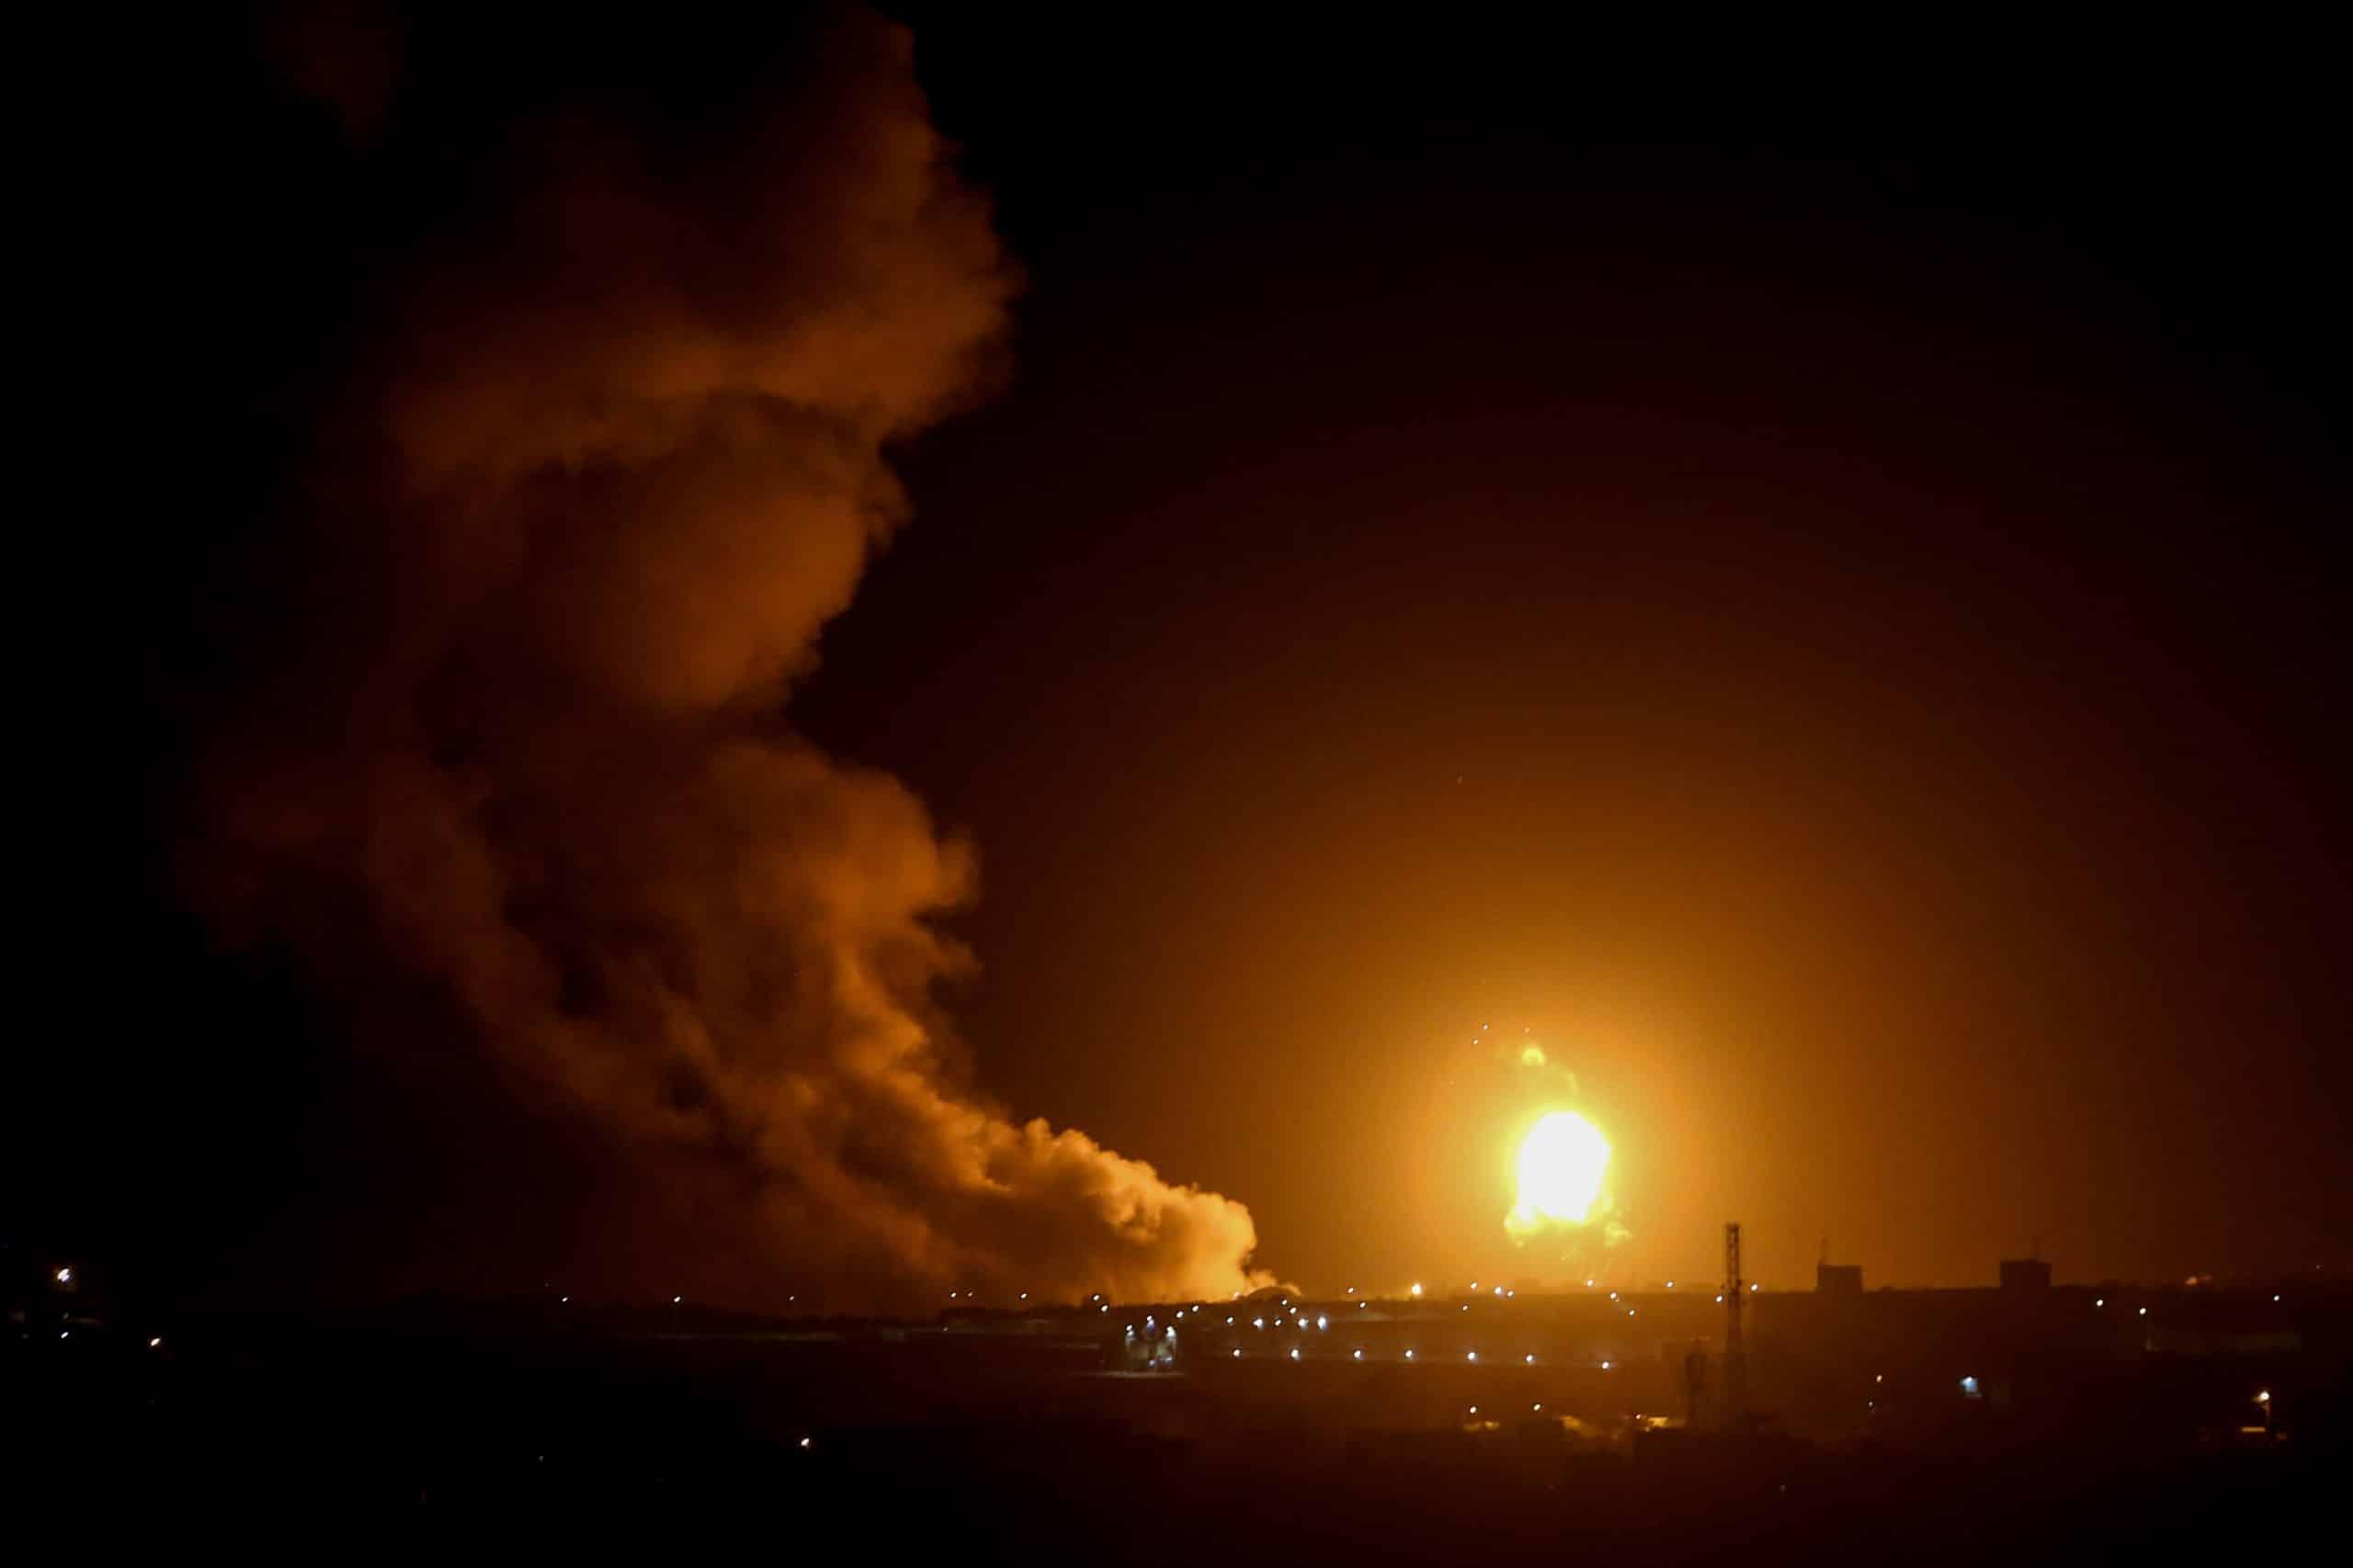 Авиаудары ЦАХАЛа по сектору Газа фото